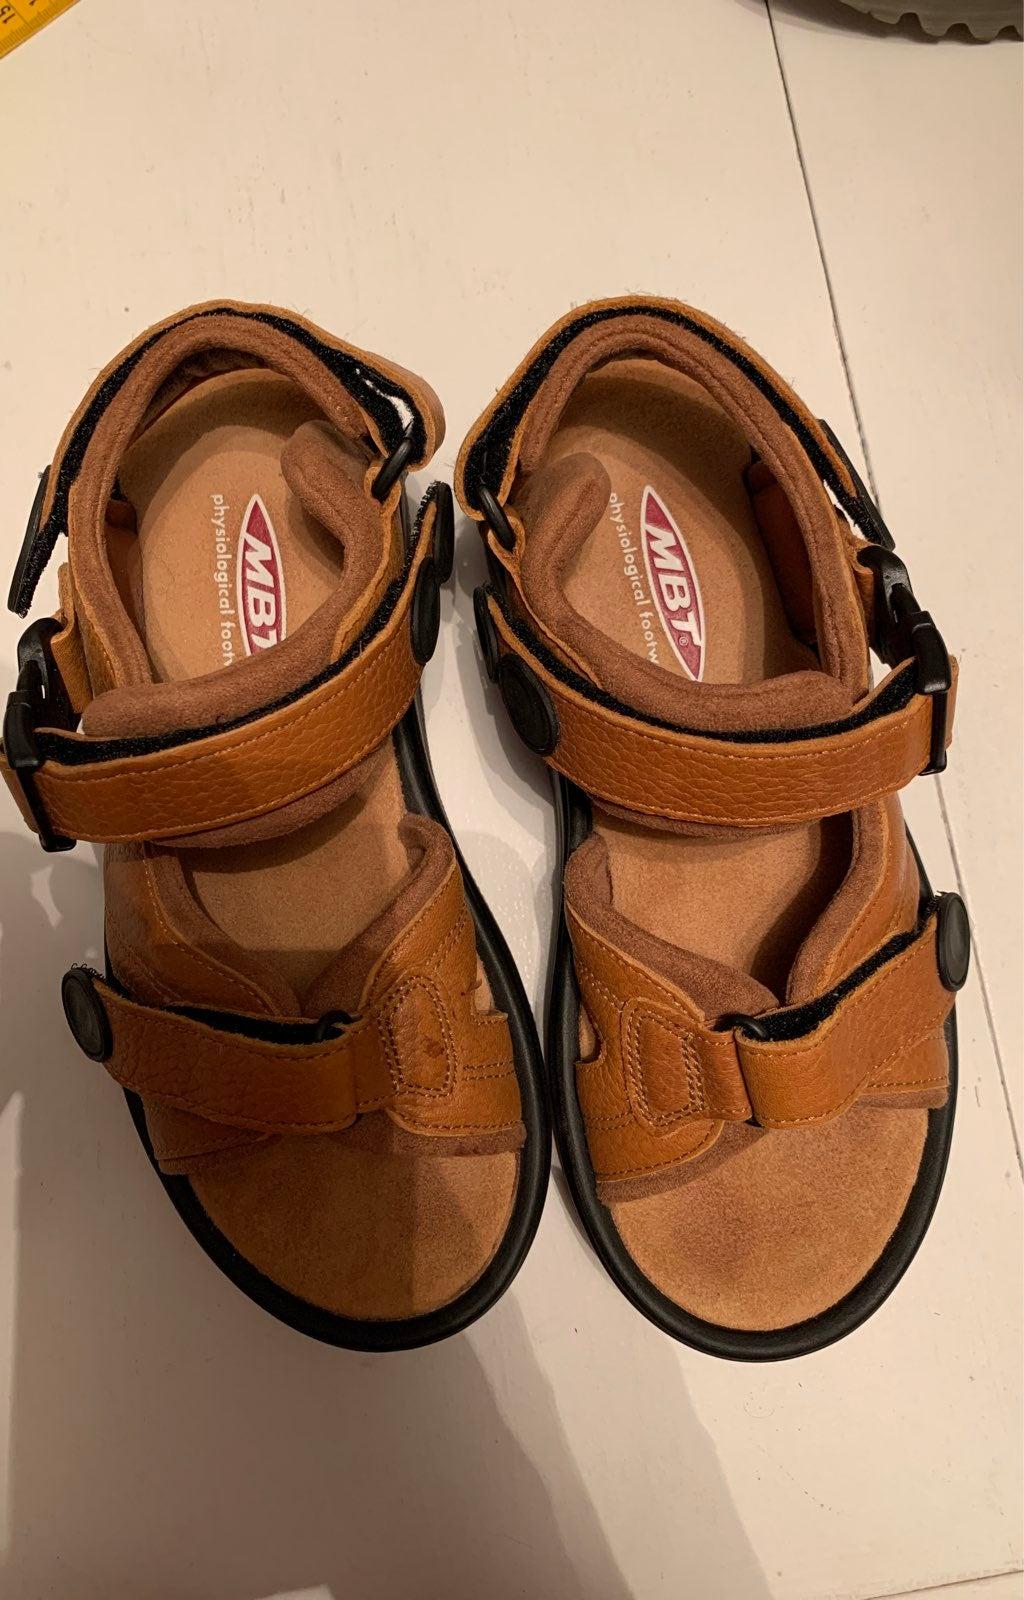 MBT Kisumu Brown C Leather Sandals 6.5